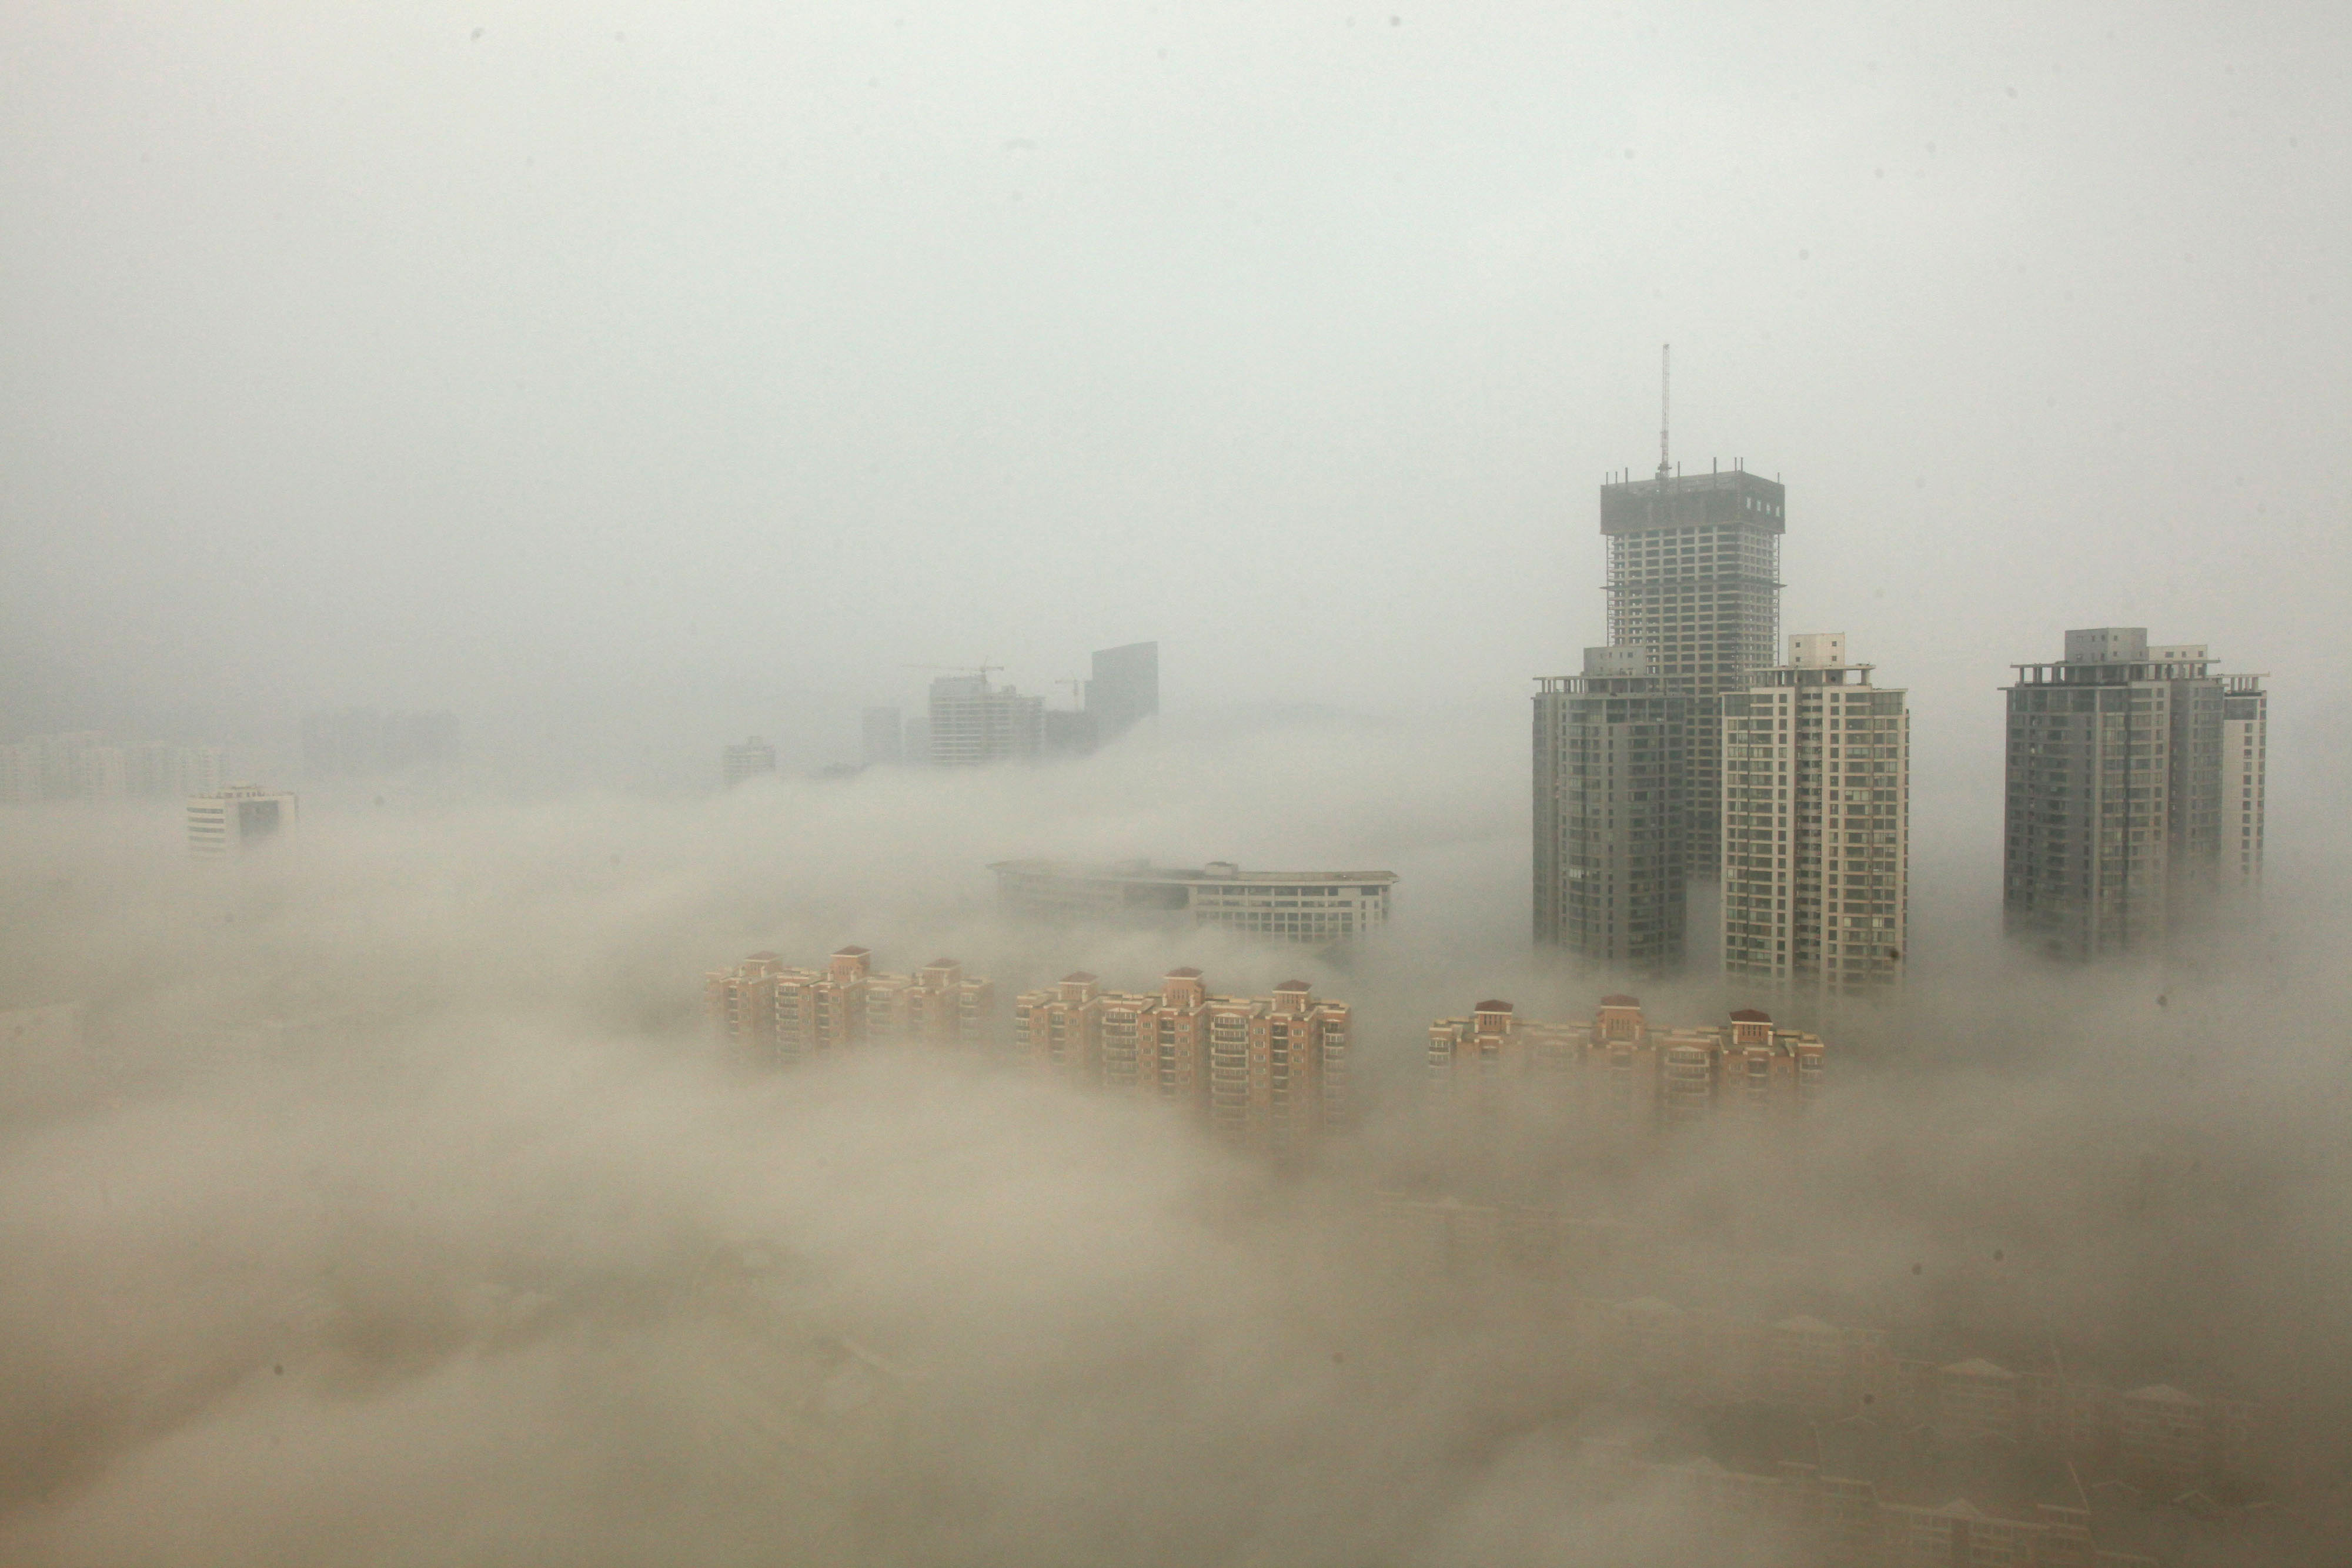 Will Xi Jinping's Speech Save the Yangtze River?